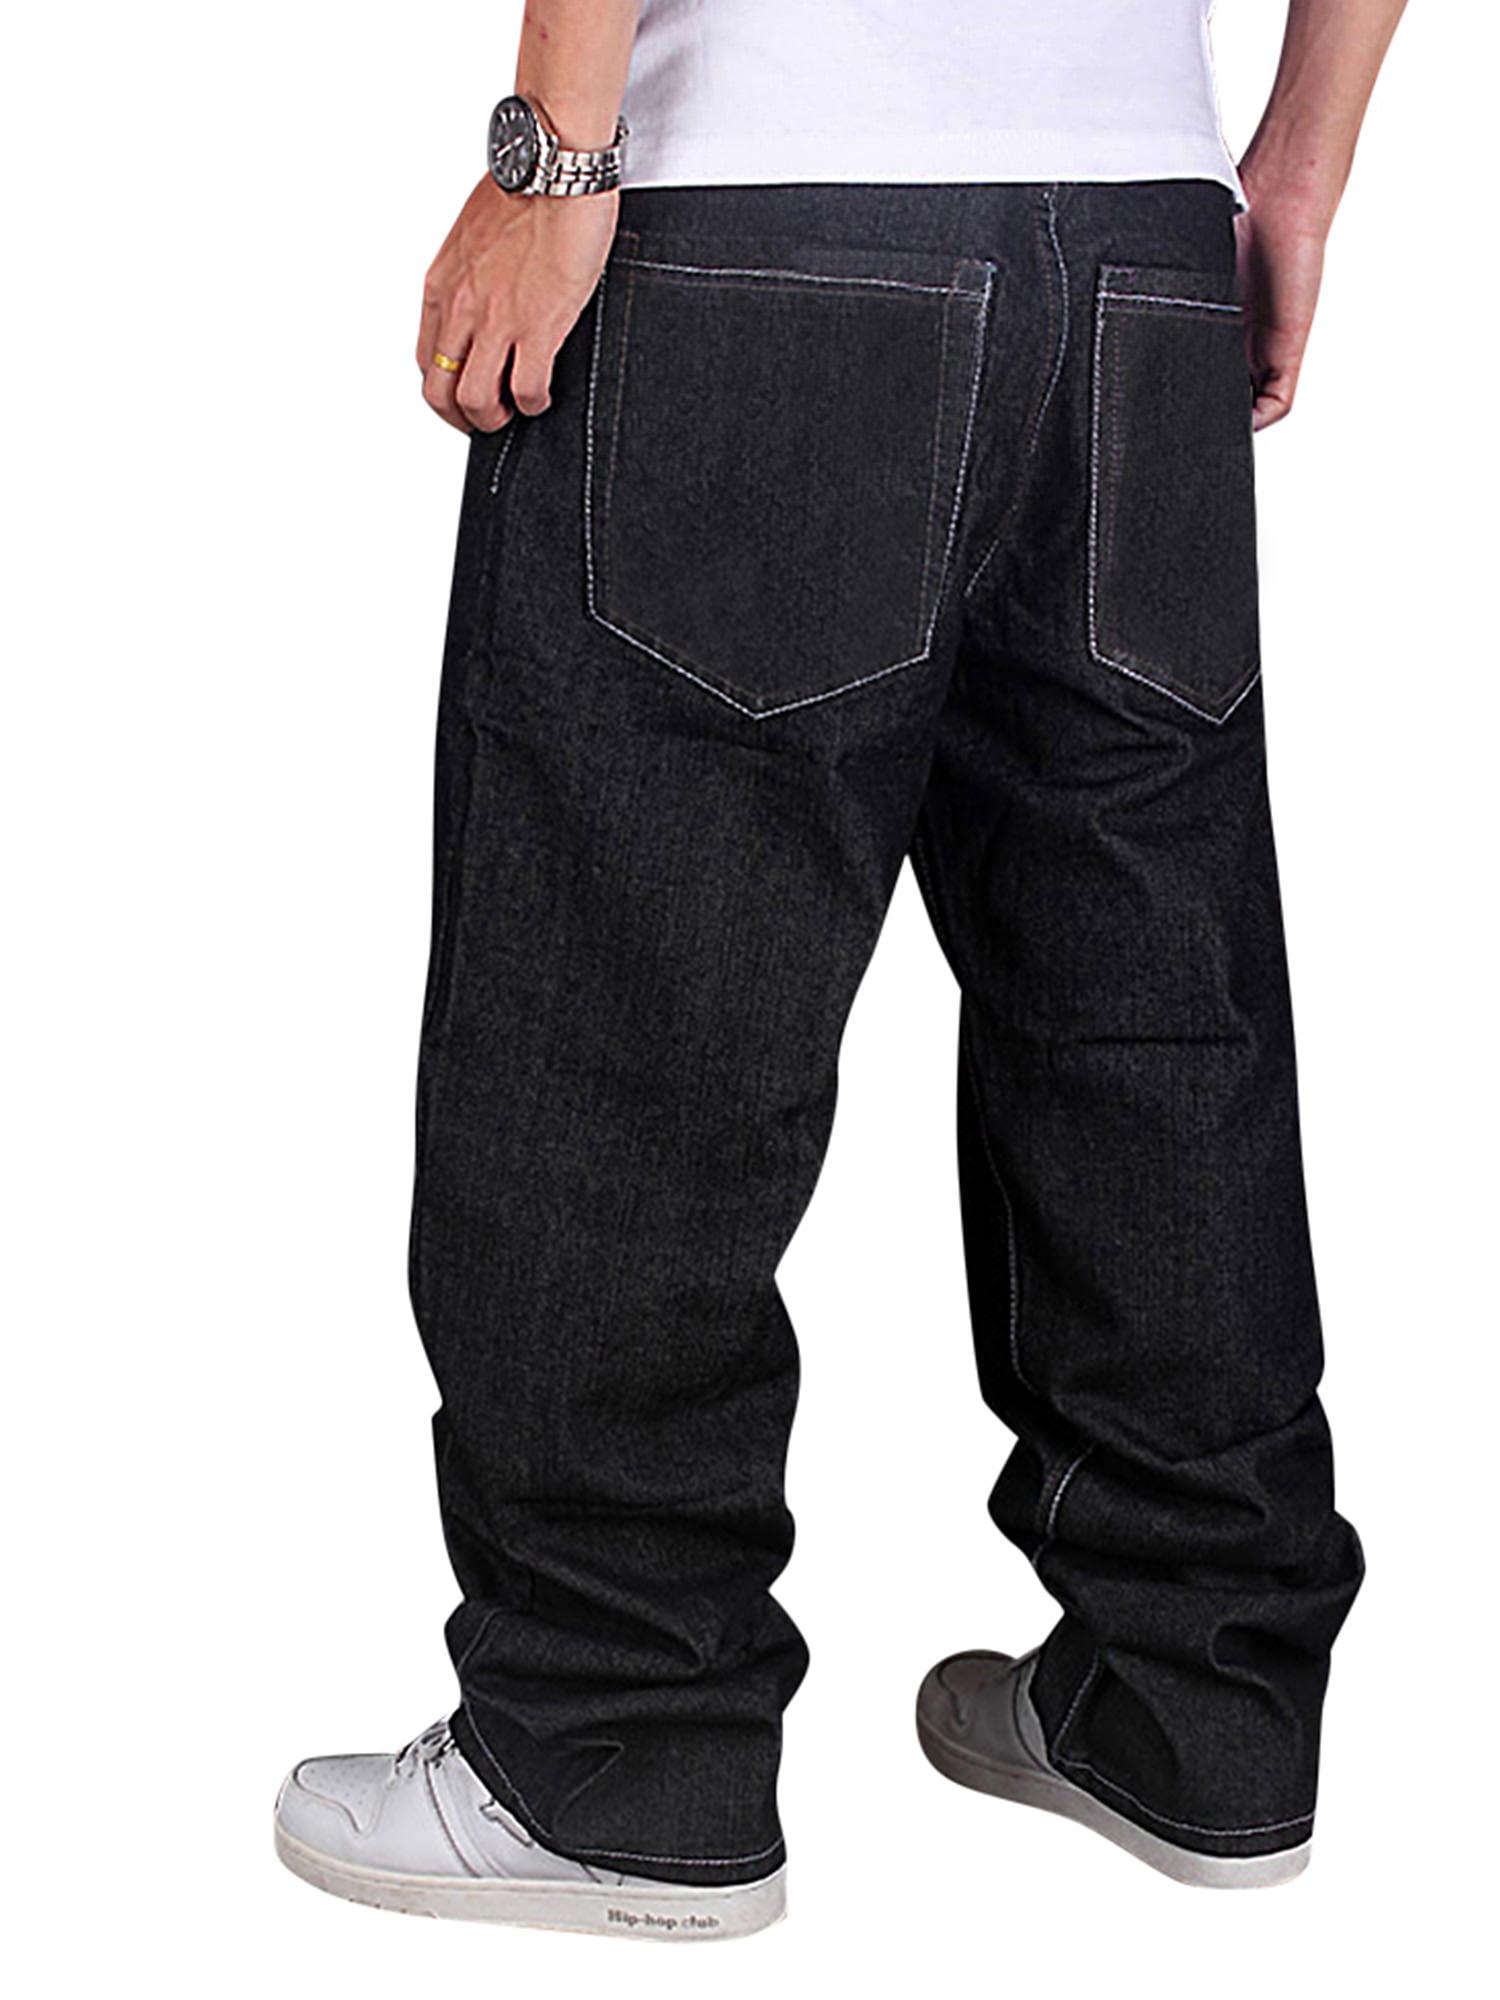 6ffd2c19 Men's Jeans Baggy Loose Denim Hip-Hop Rap Skateboard Pants Streetwear